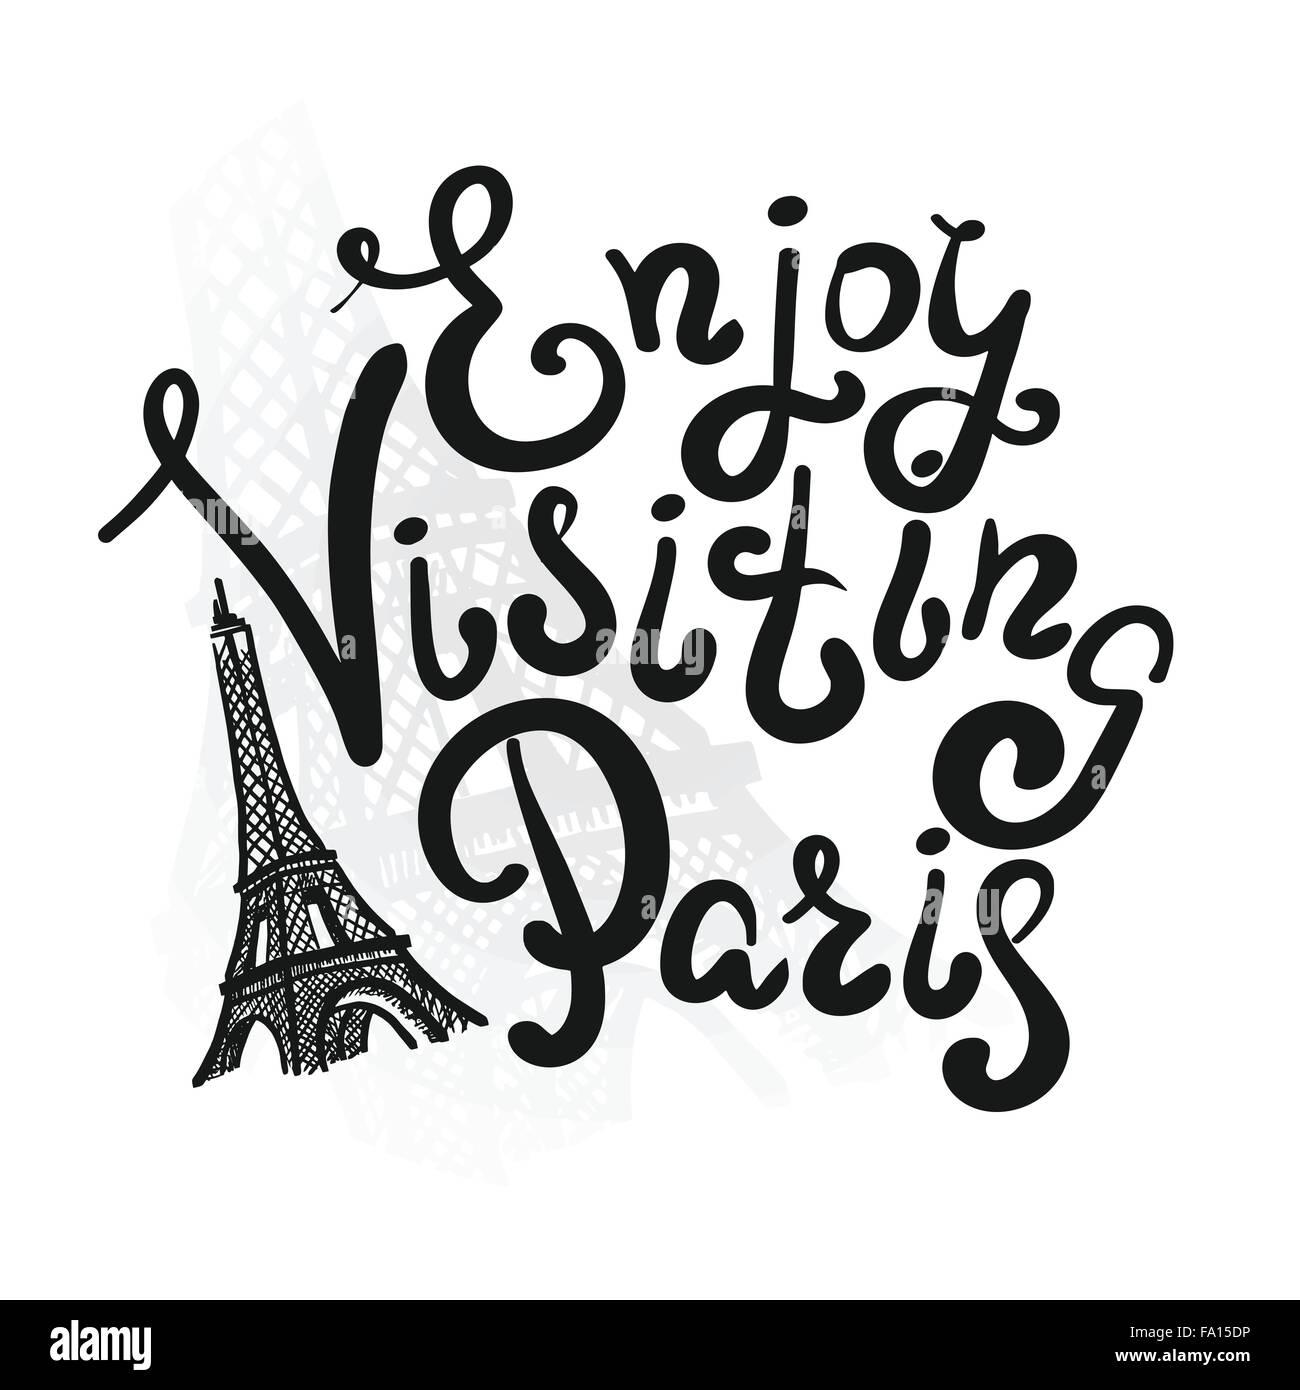 Enjoy visiting paris - Stock Vector